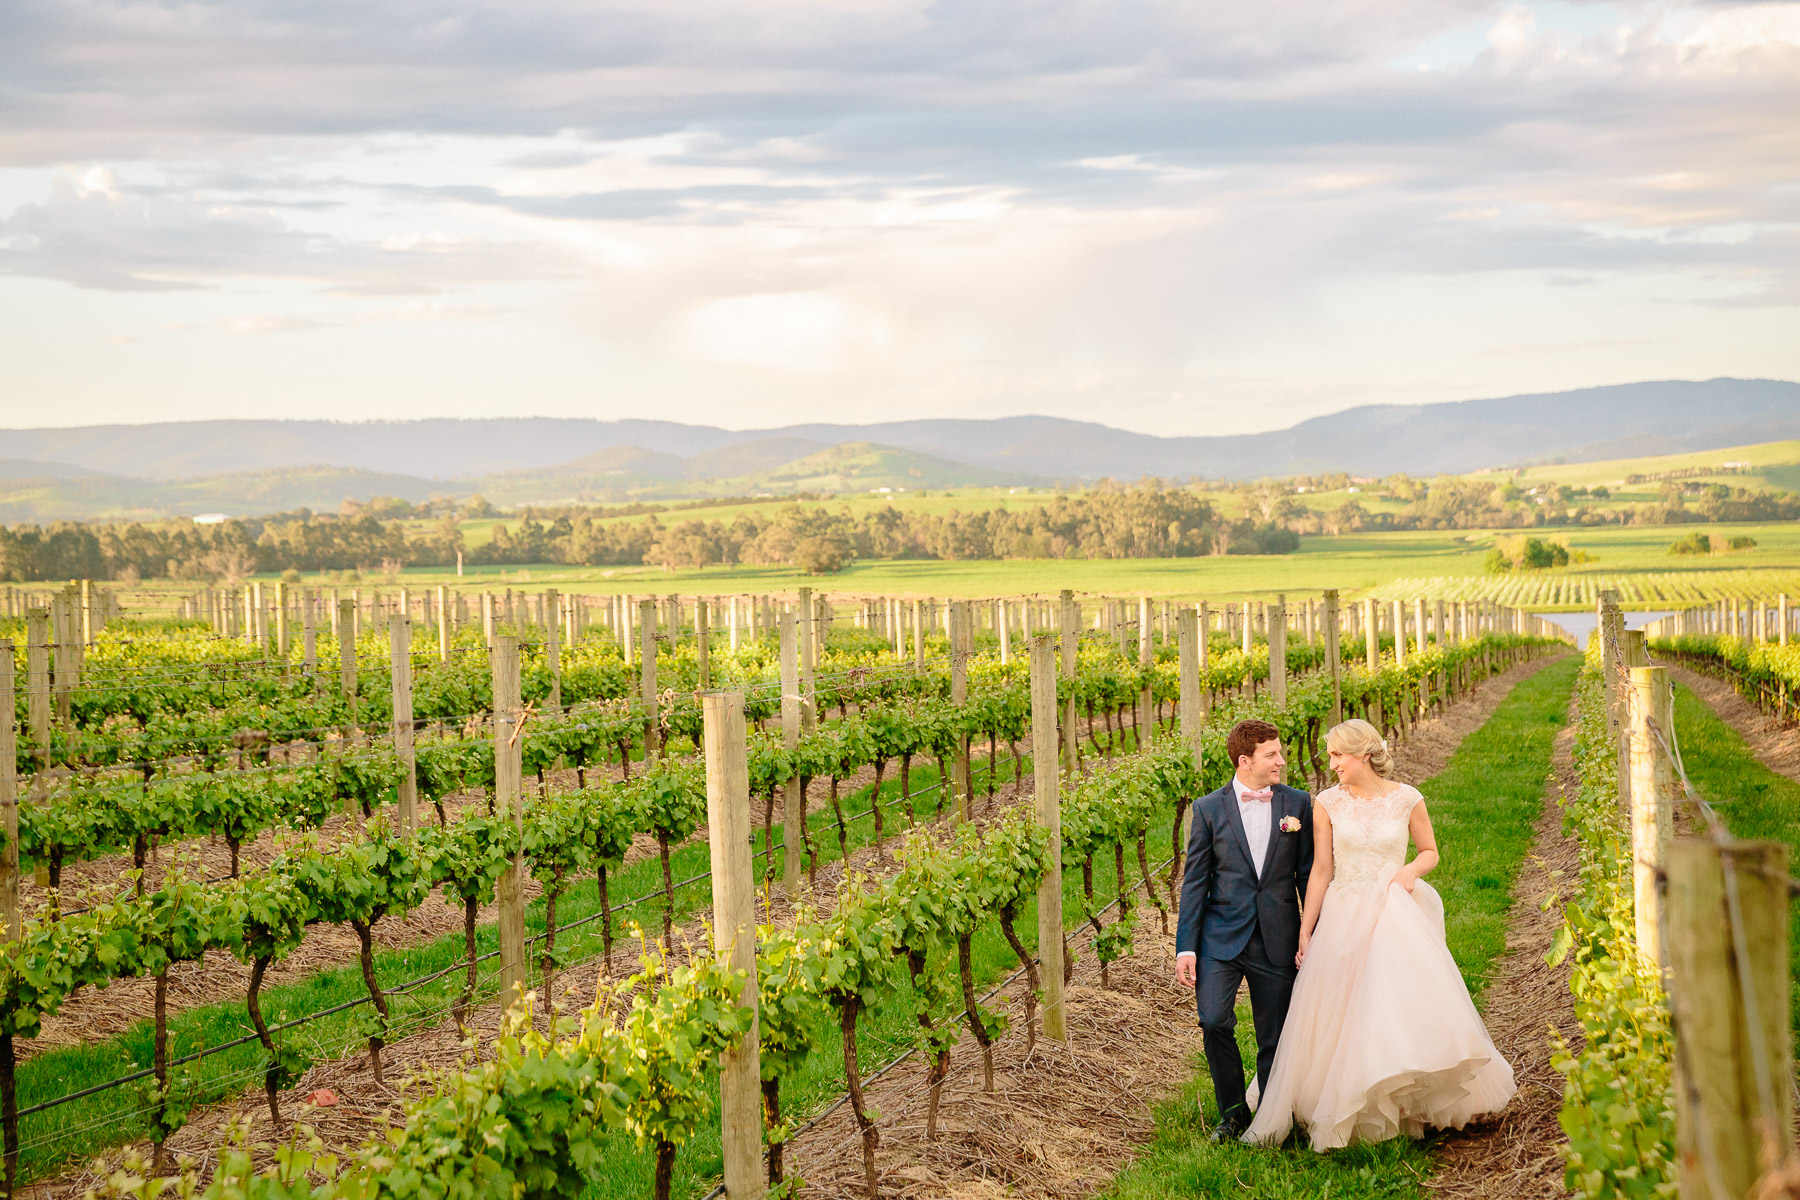 Marnie_and_Charlie_Yarra_Valley_Wedding_Blog-77.jpg